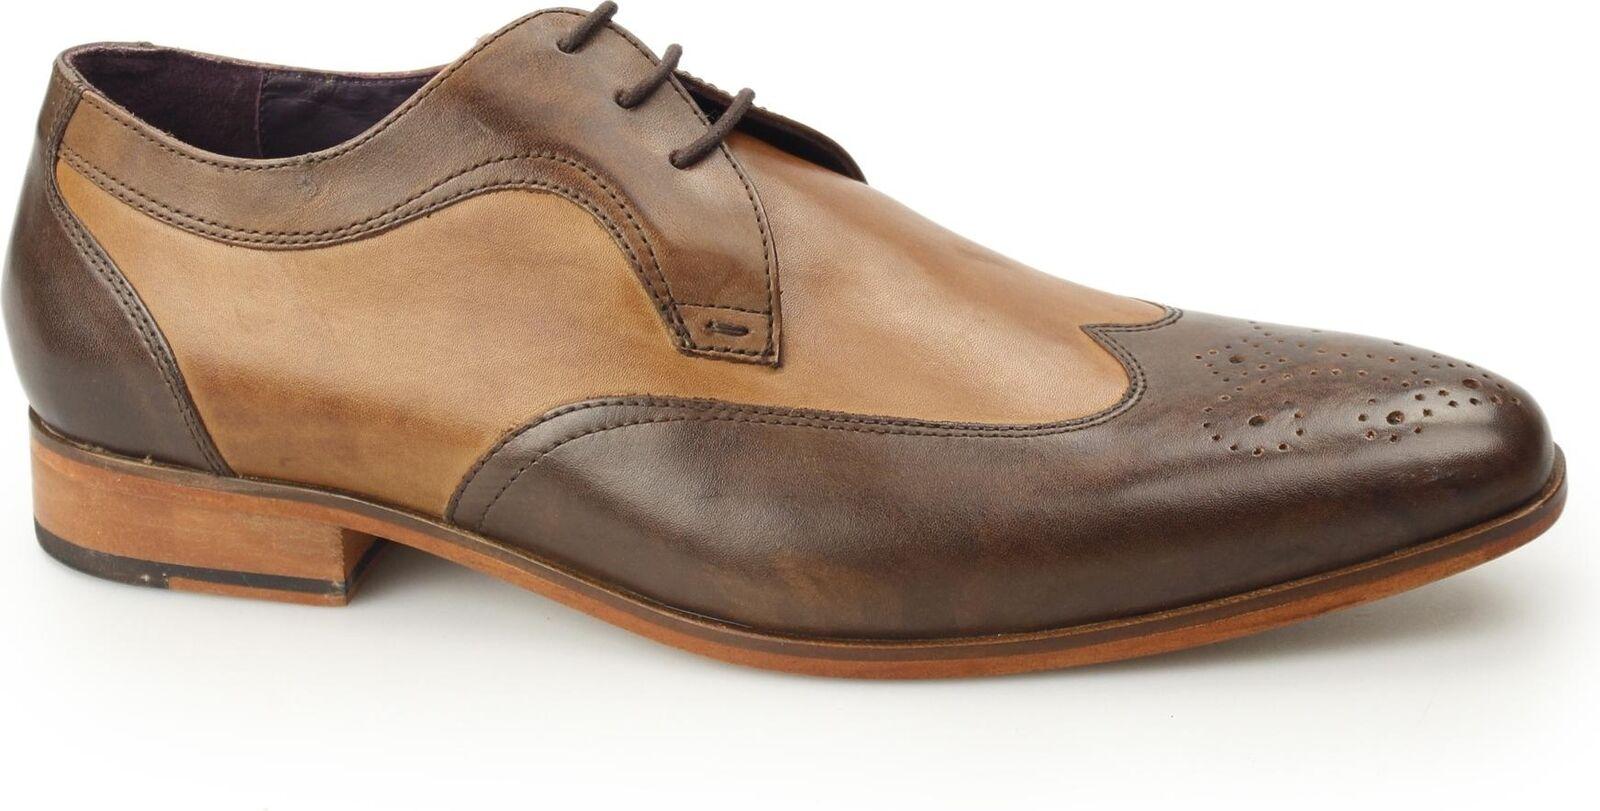 Gucinari MILLE Mens Leather Formal Wingtip Contrast Derby Brogues Brogues Brogues braun & Tan f7cca6